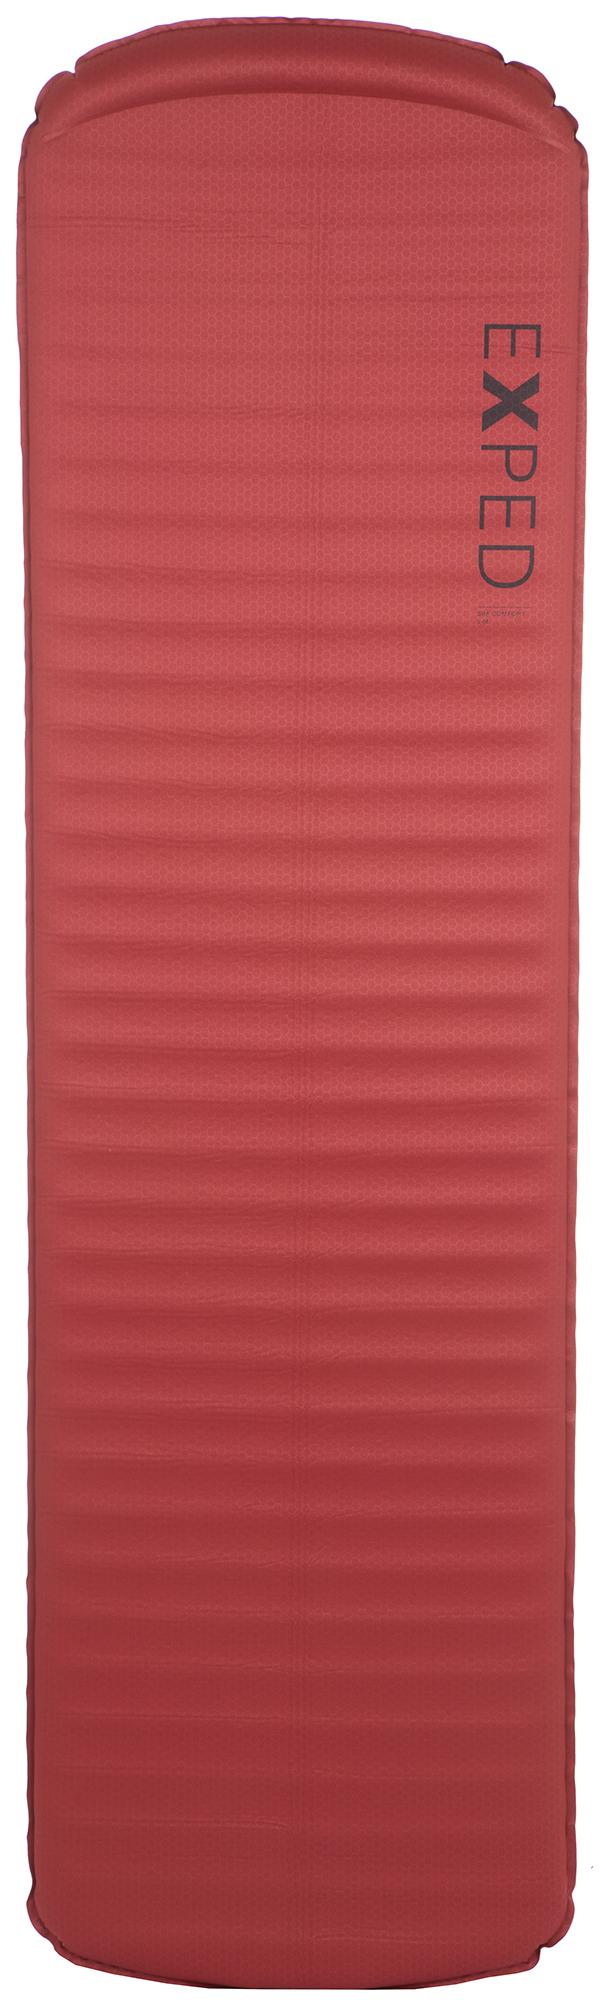 коврик norfin коврик самонадувающийся atlantic comfort nf 5 0см Exped Коврик самонадувающийся Exped SIM Comfort 5 M, 183 см